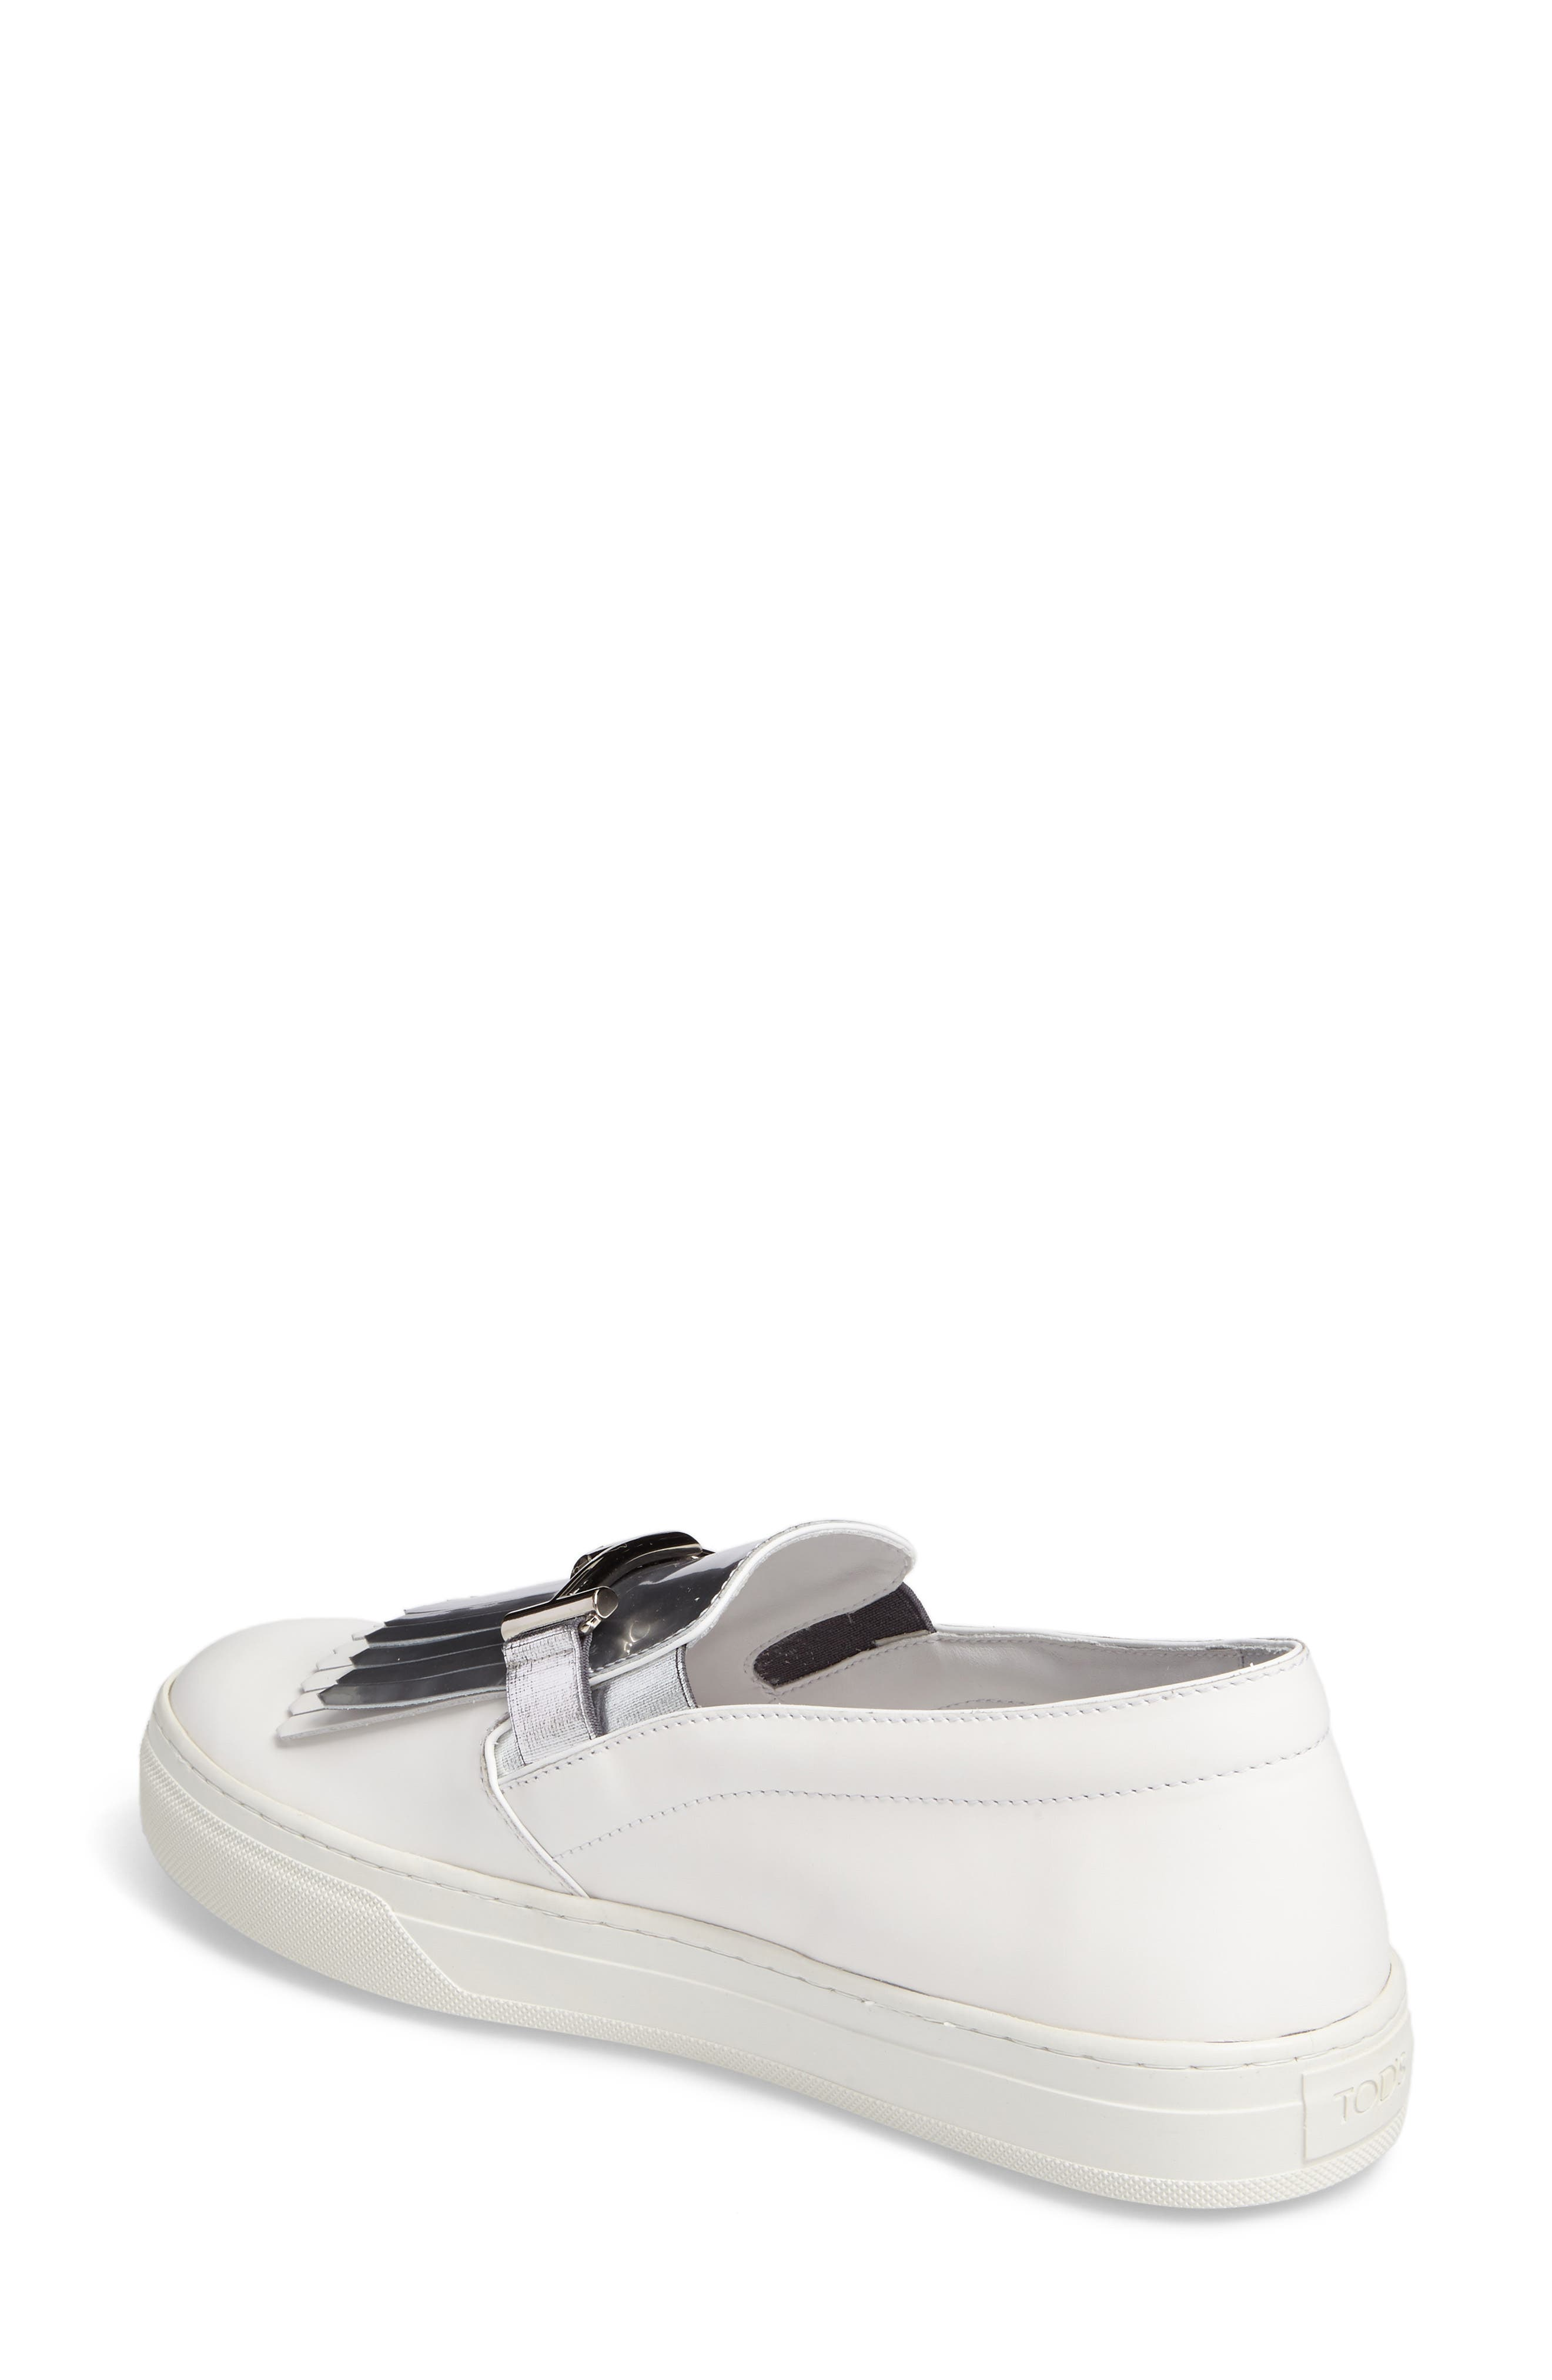 Alternate Image 2  - Tod's Double-T Kiltie Fringe Slip-On Sneaker (Women)